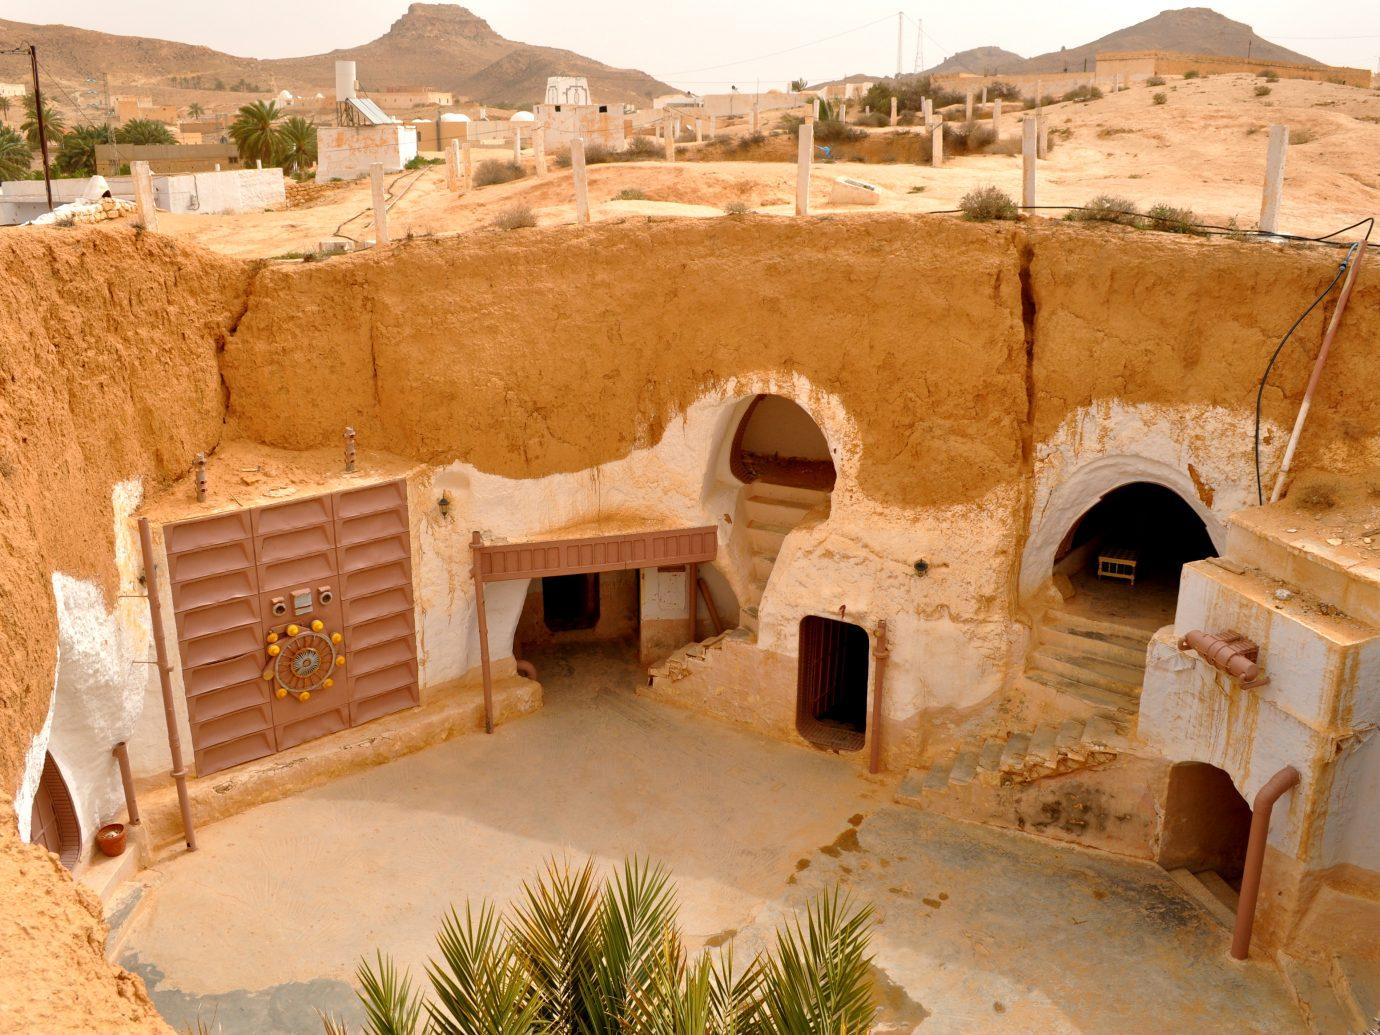 Hotel Sidi Driss exterior